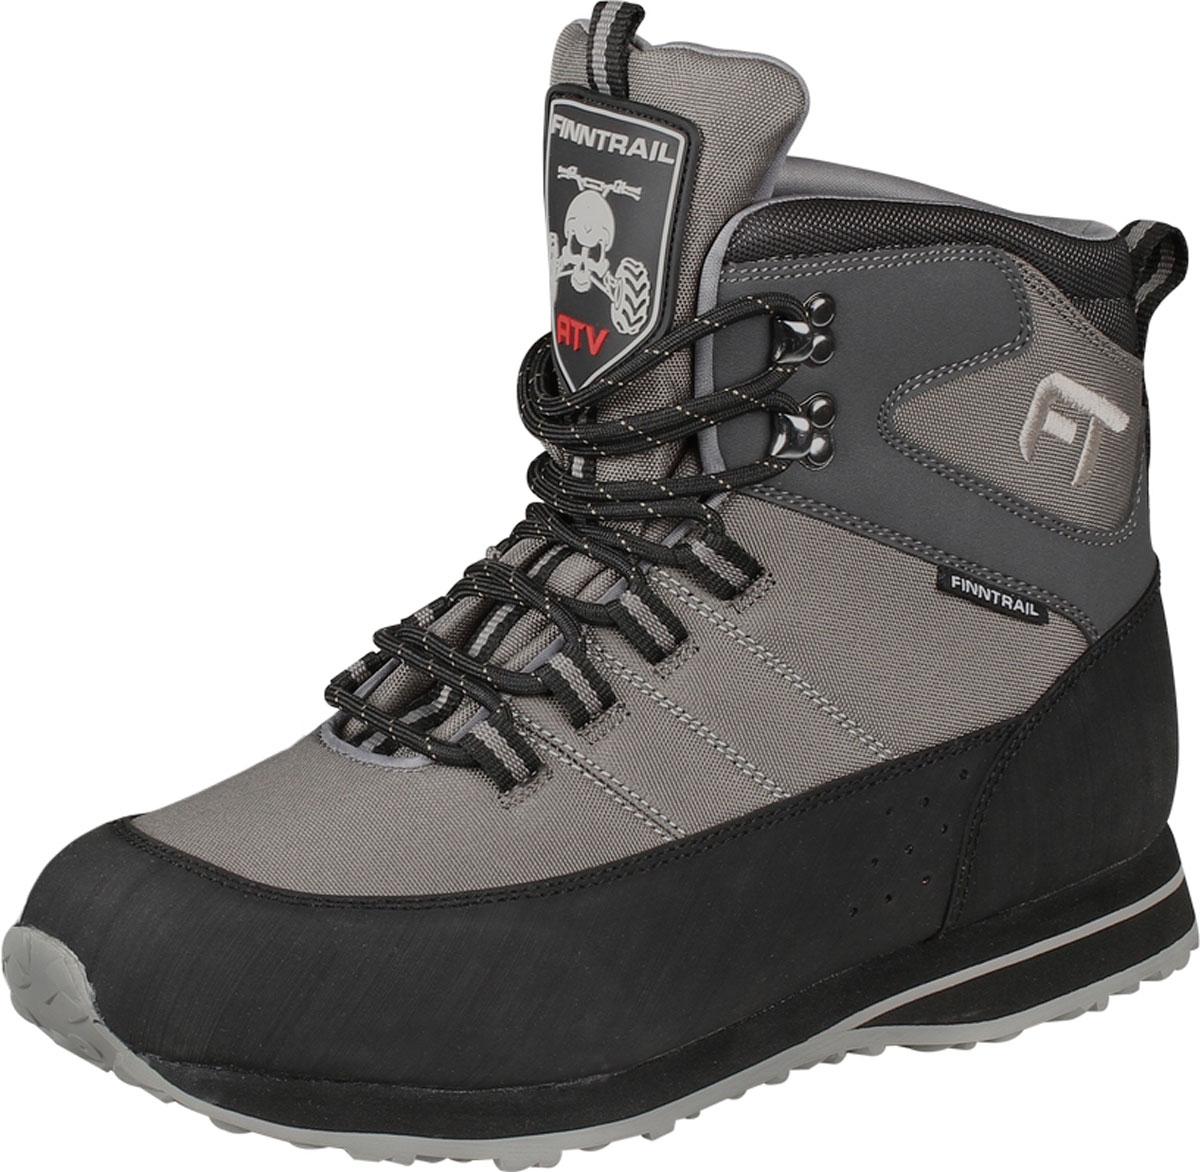 Ботинки для рыбалки Finntrail New Stalker, цвет: серый, черный. 5192. Размер 42